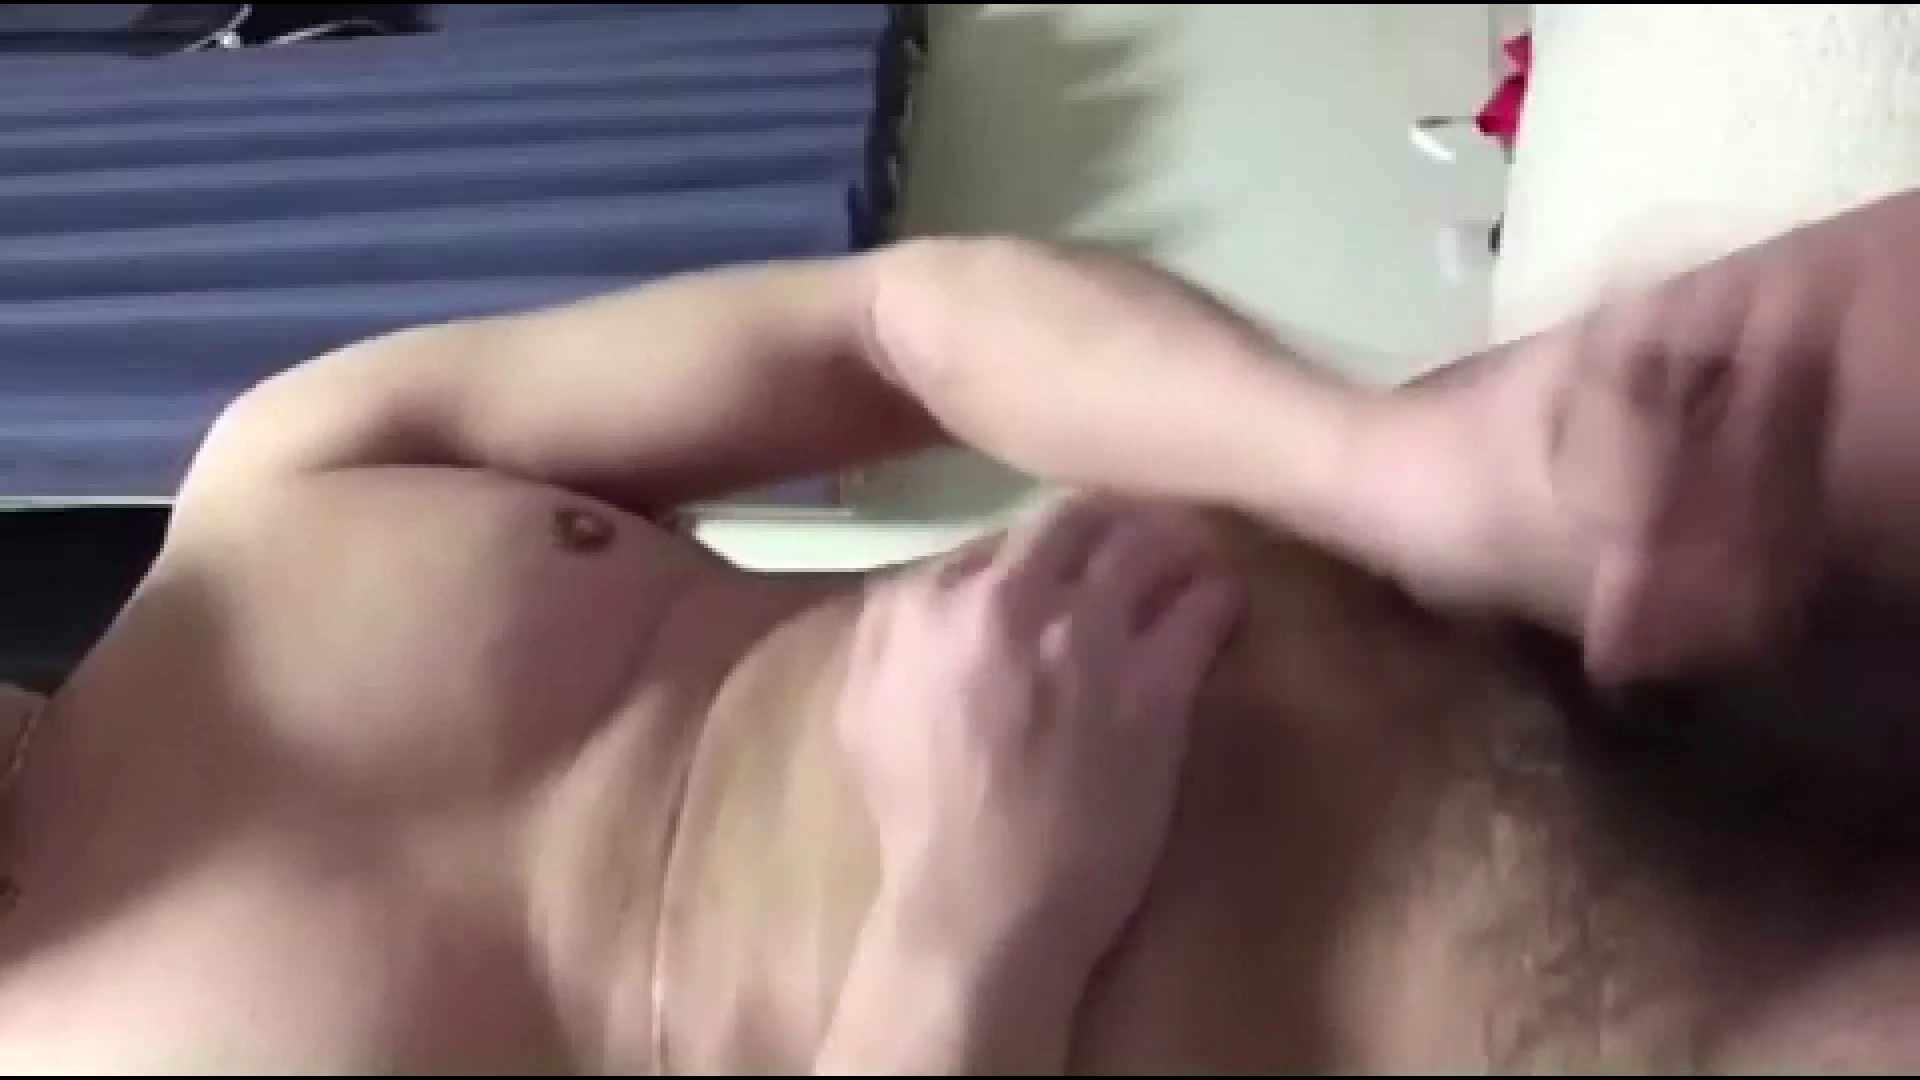 個人撮影 自慰の極意 Vol.17 手淫 AV動画 105枚 66